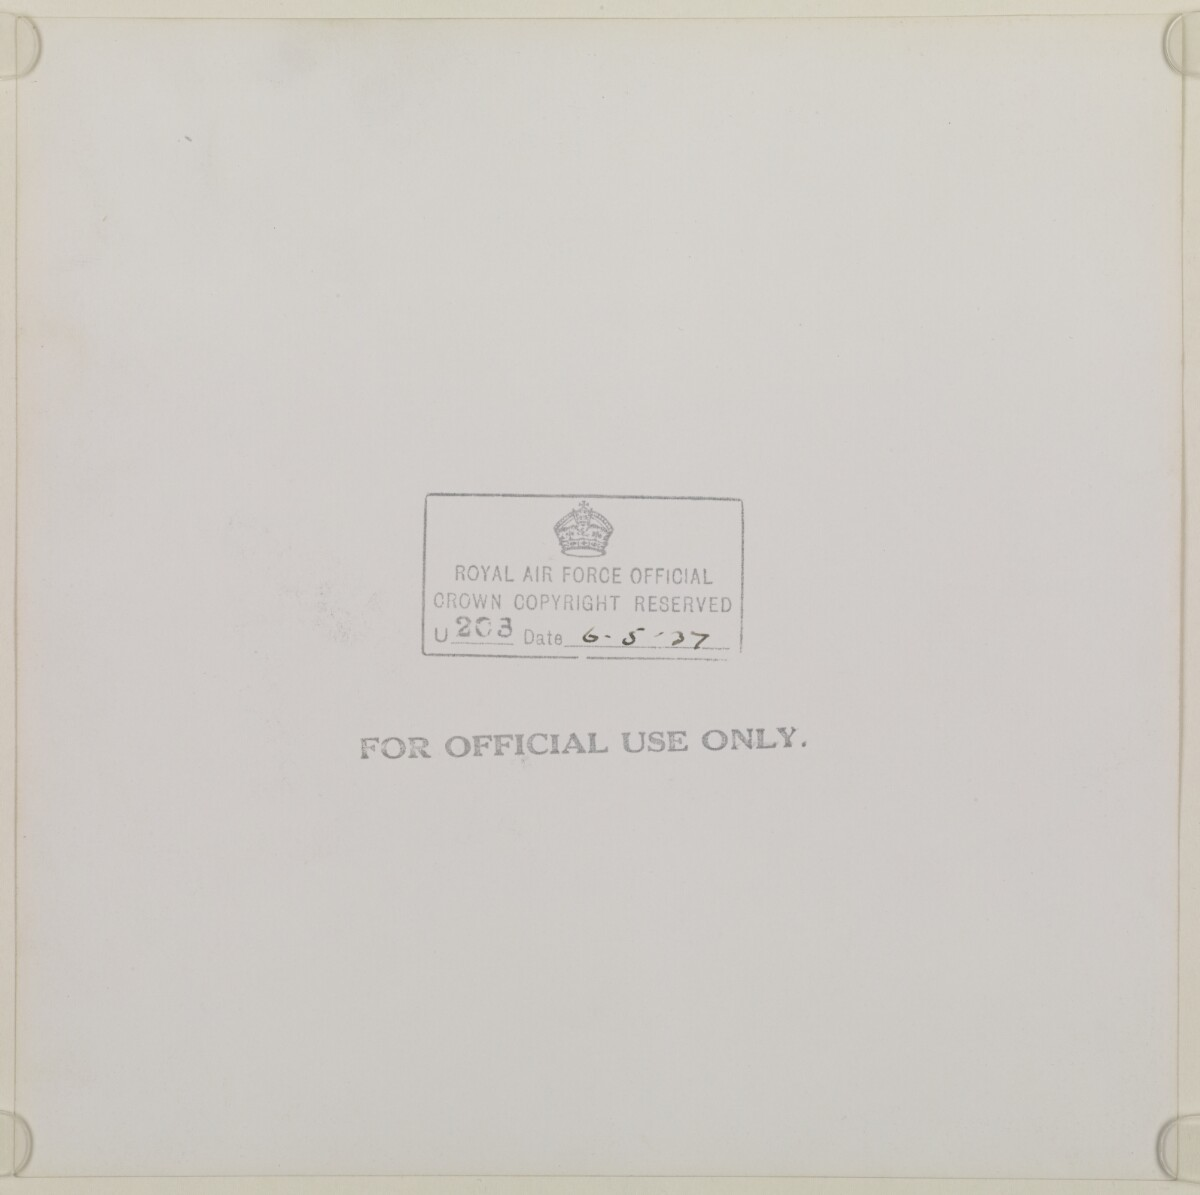 'File 19/243 II (C 72) Zubarah' [163v] (339/444)